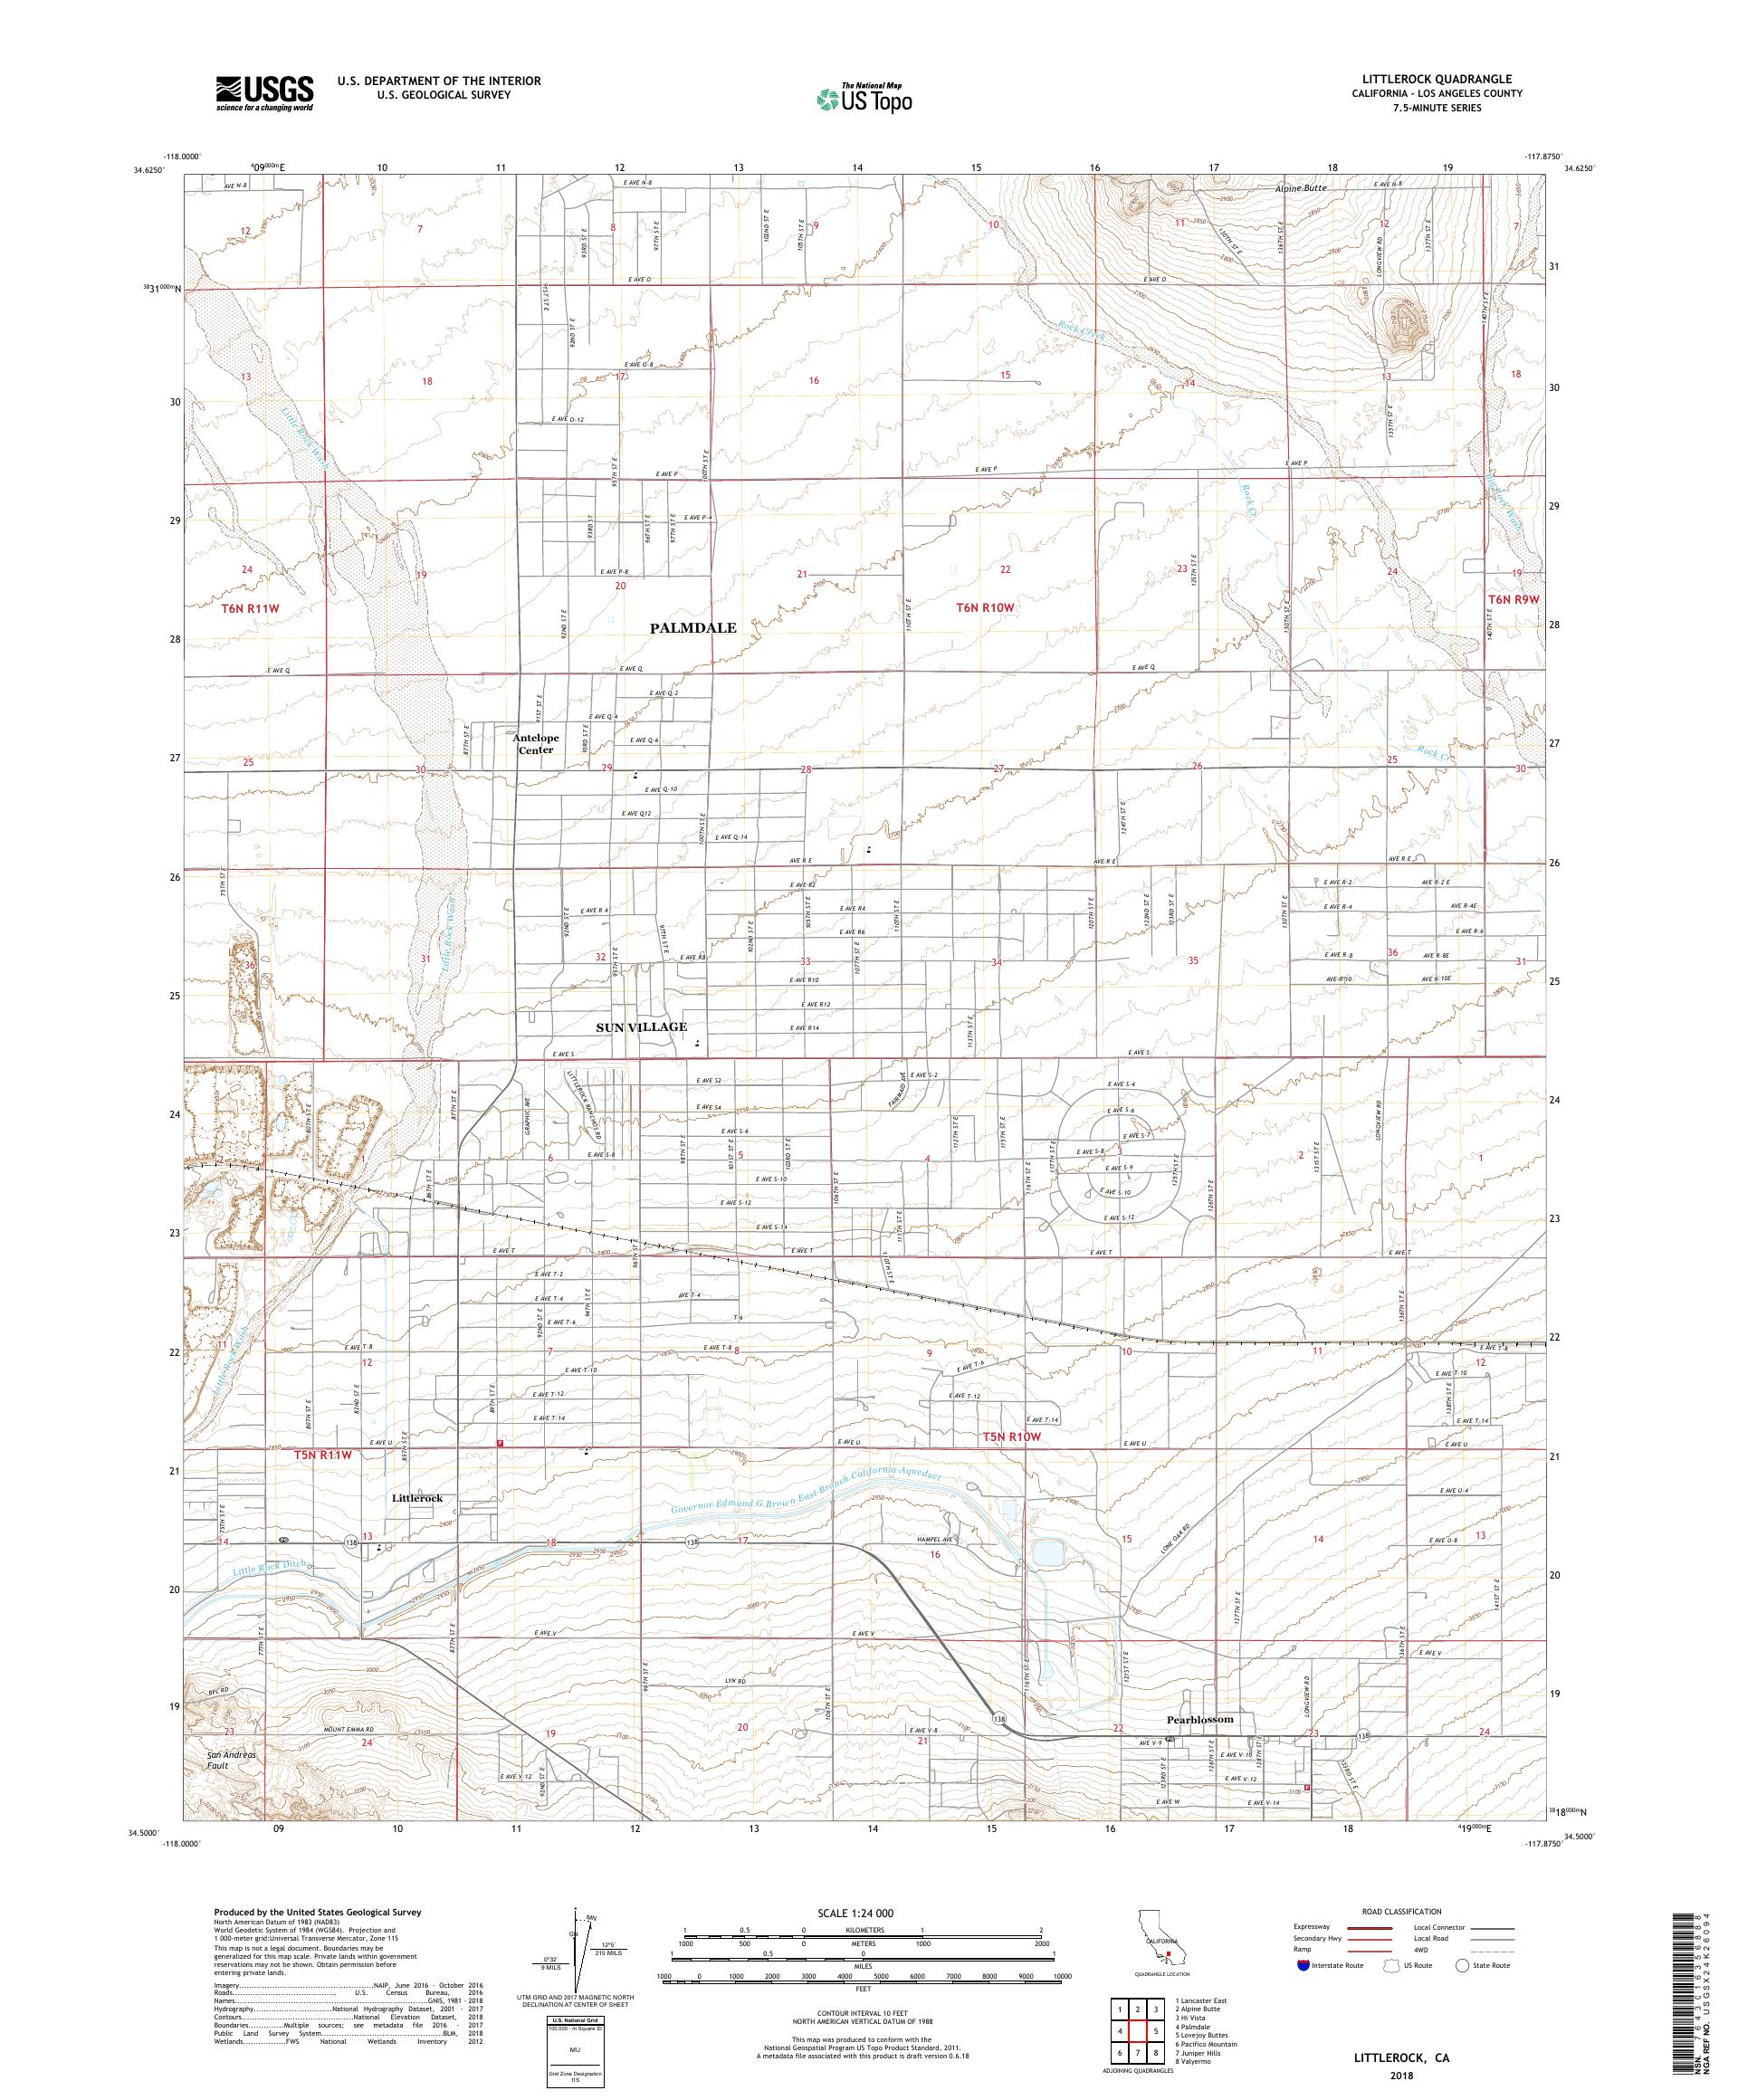 MyTopo Littlerock, California USGS Quad Topo Map